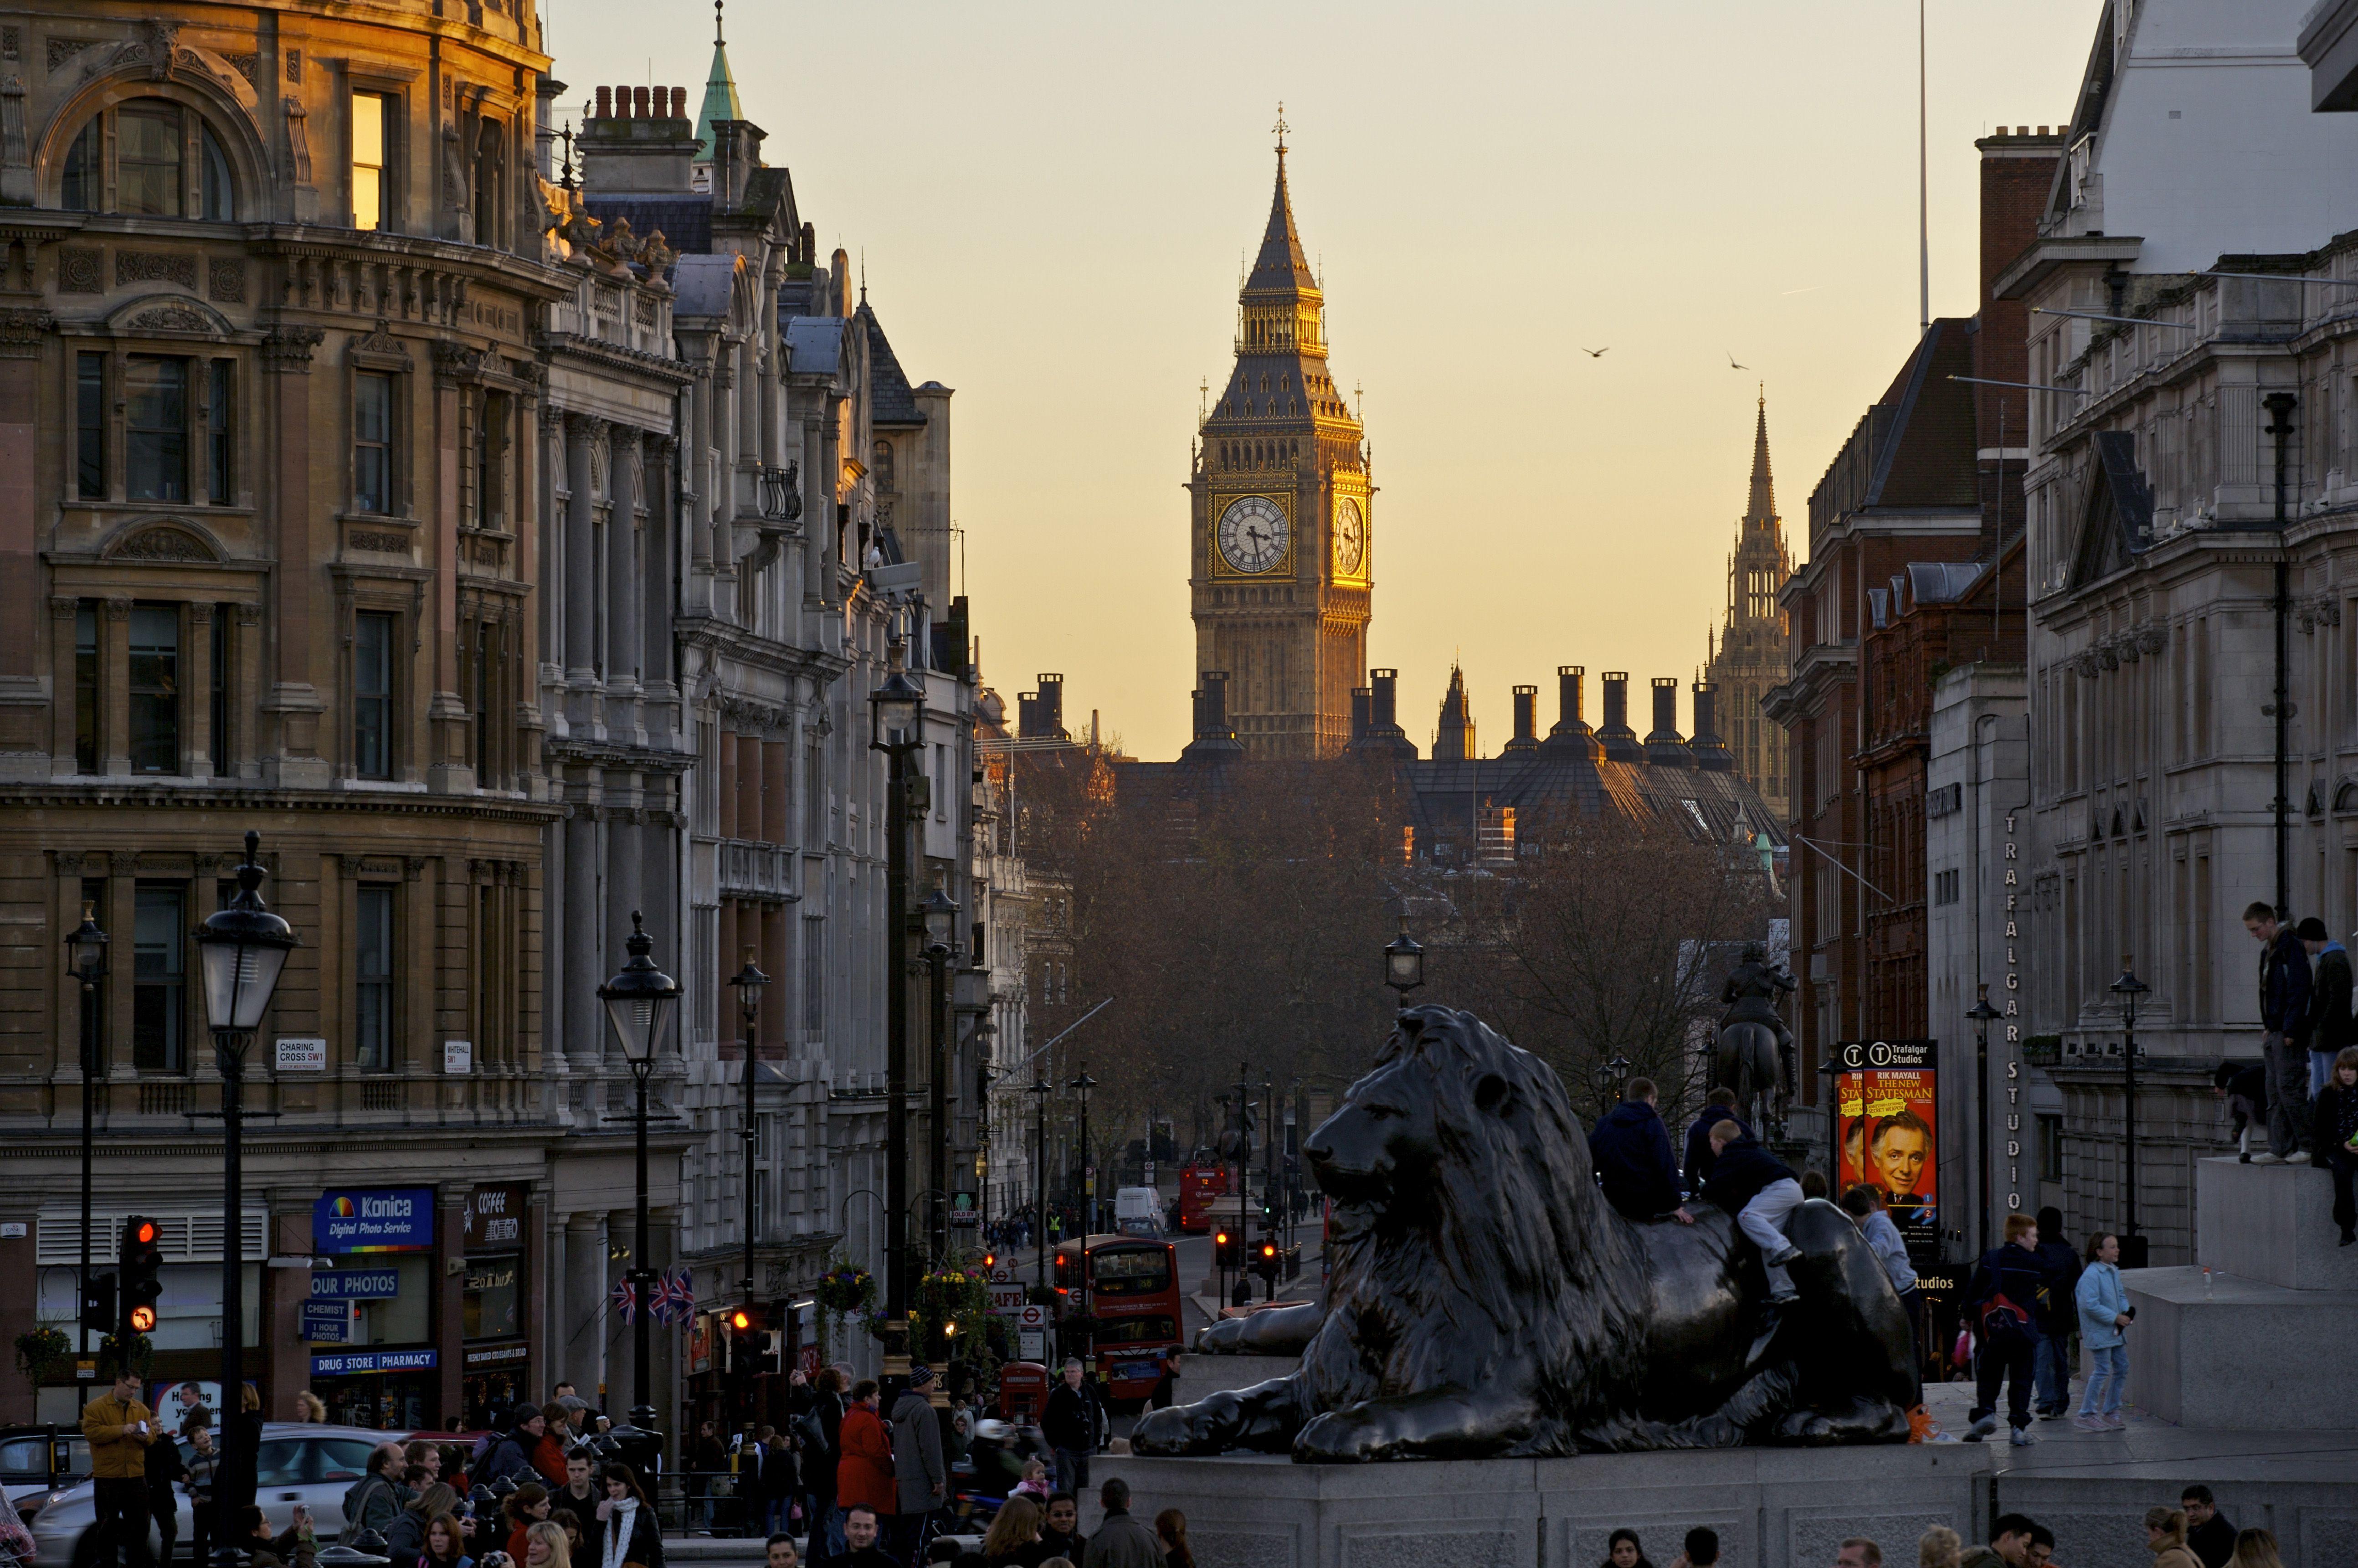 England, London, View from Trafalgar Square down Whitehall to Big Ben